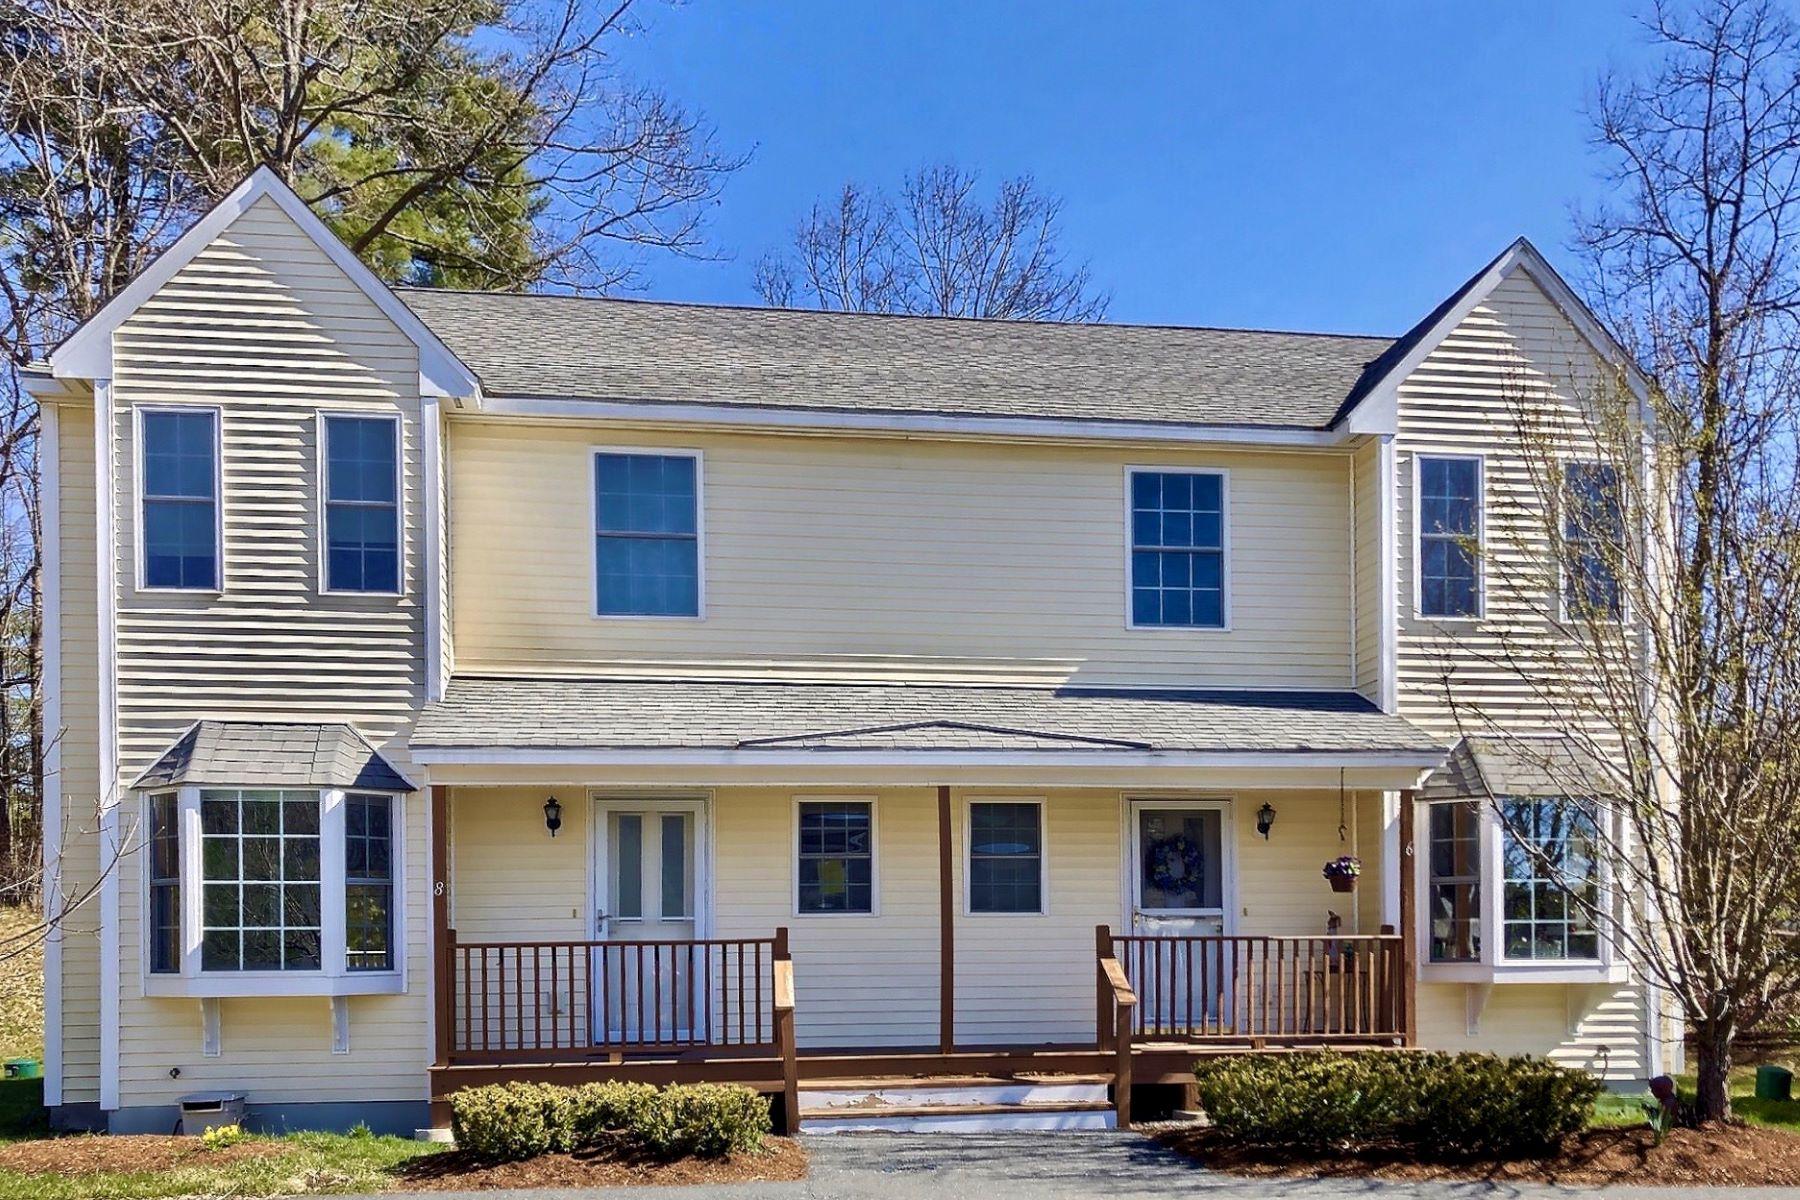 Condominiums for Active at 6 Westboro Woods Lane E-9 Lebanon, New Hampshire 03784 United States